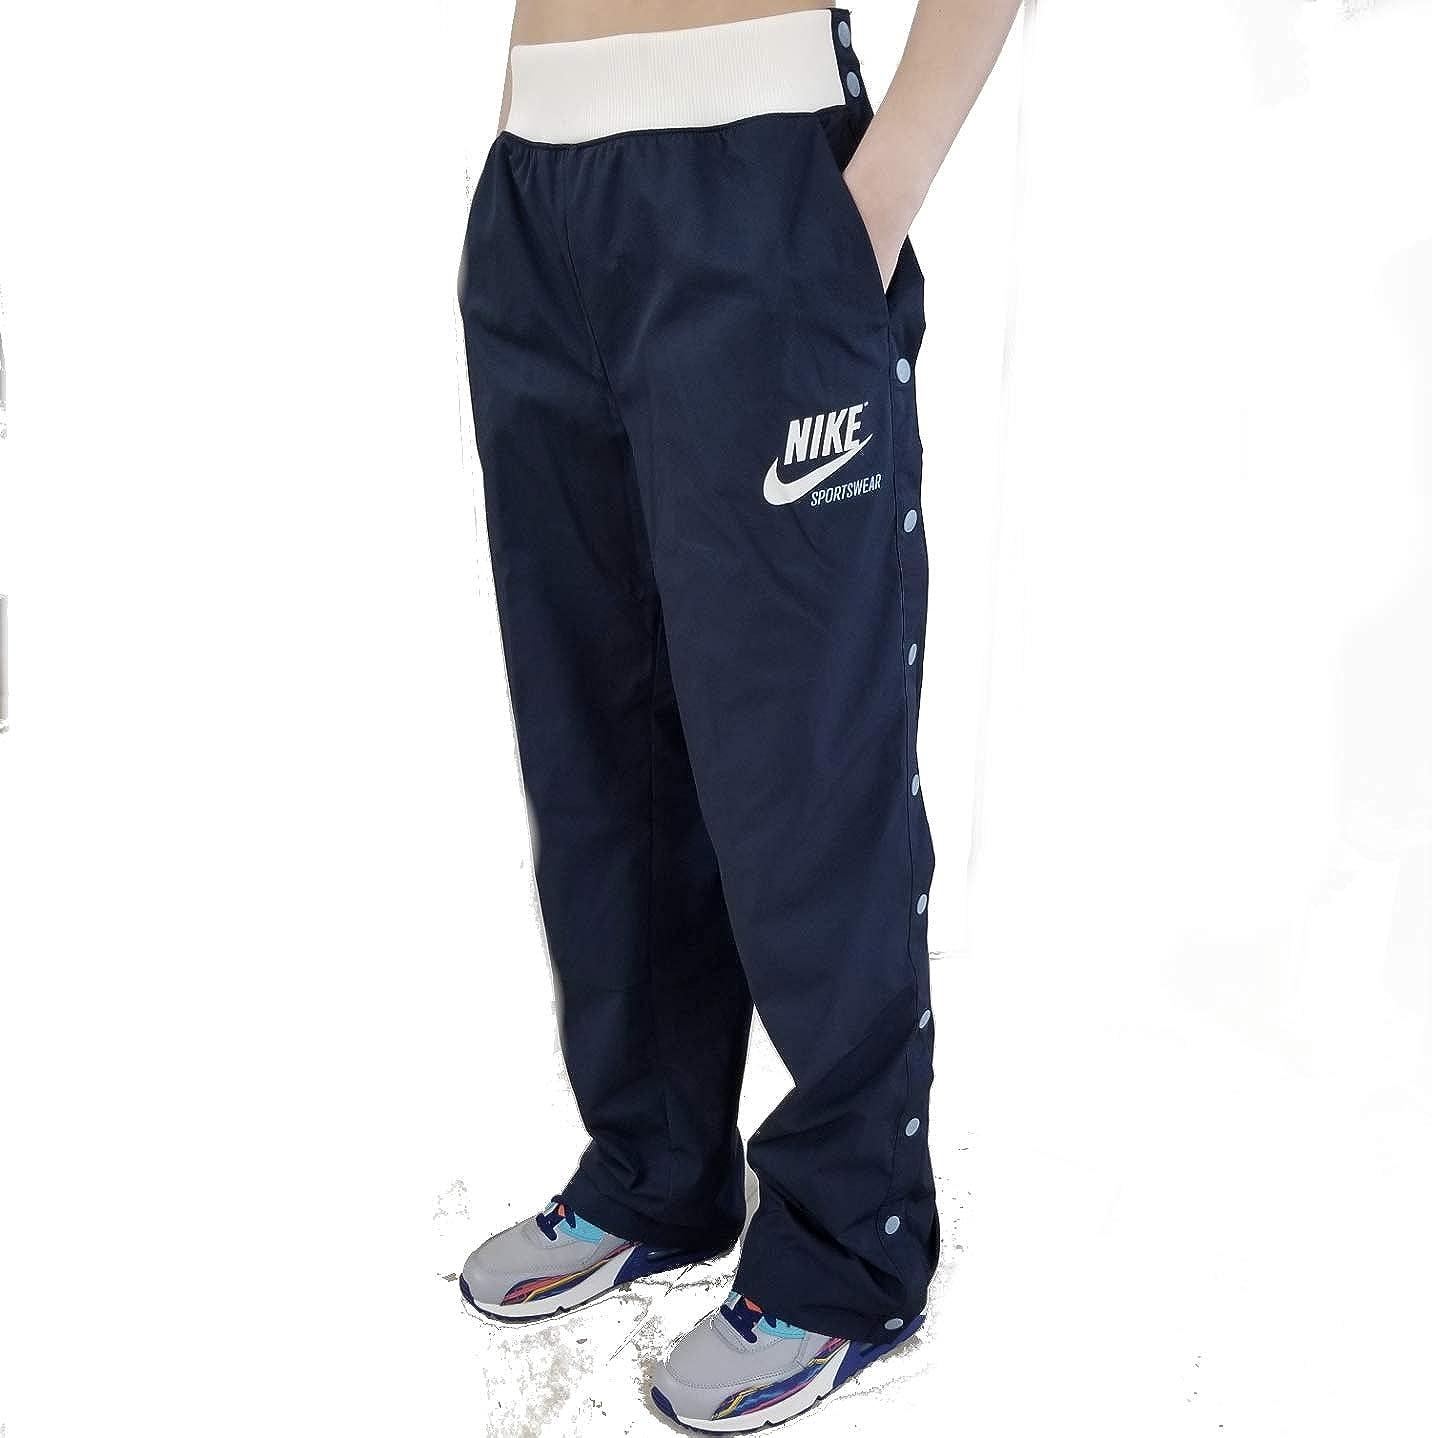 2019 hot sale 50-70%off outlet for sale Amazon.com: Nike Sportswear Archive Women's Snap Pants ...